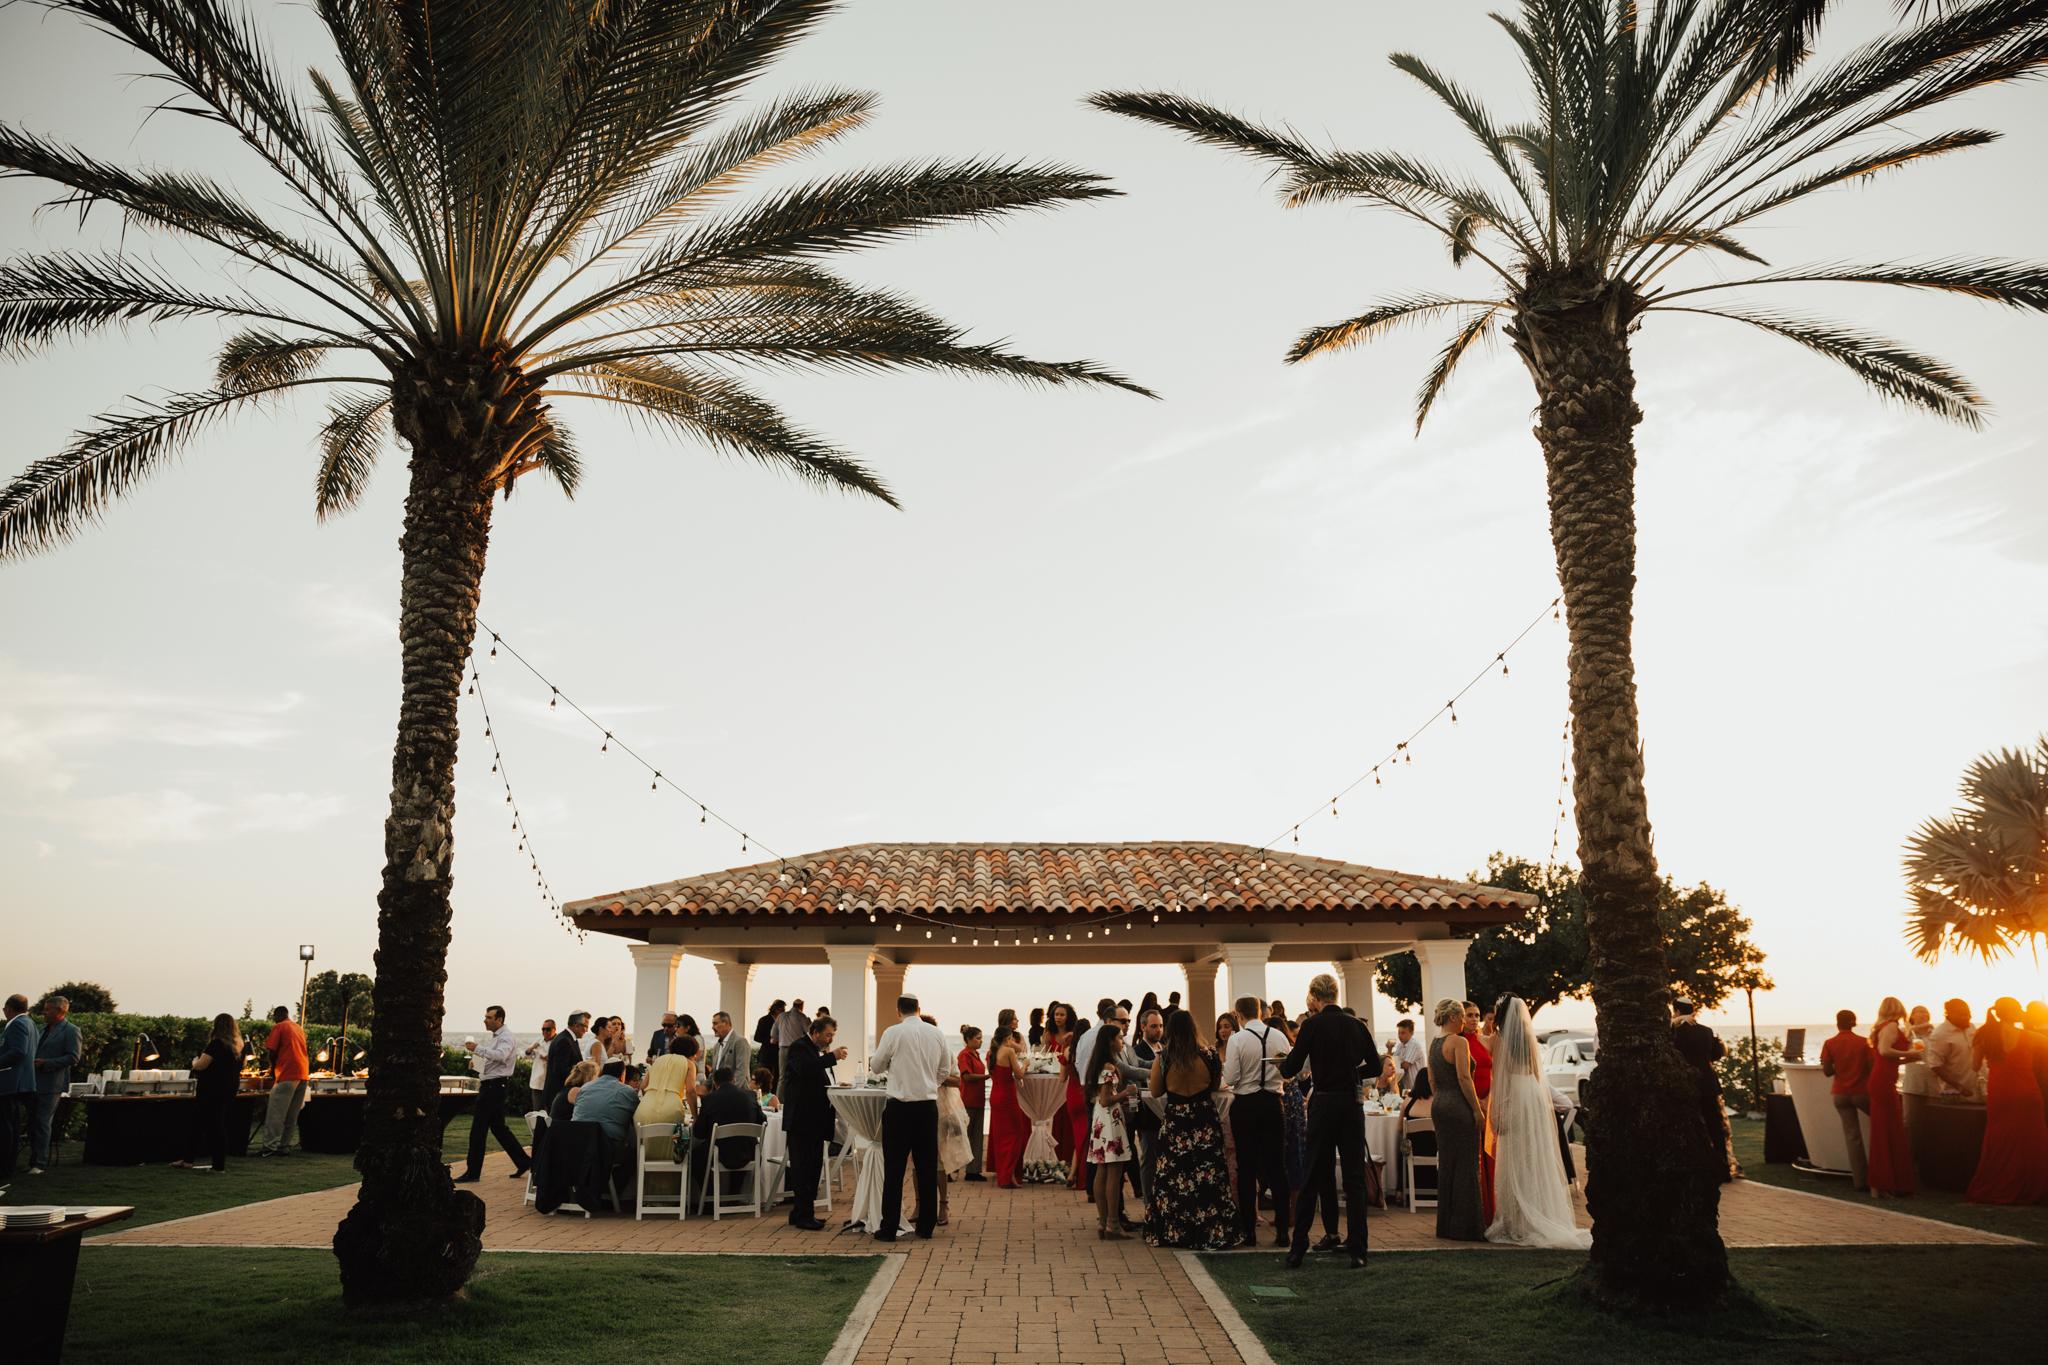 curacao_wedding-181.jpg